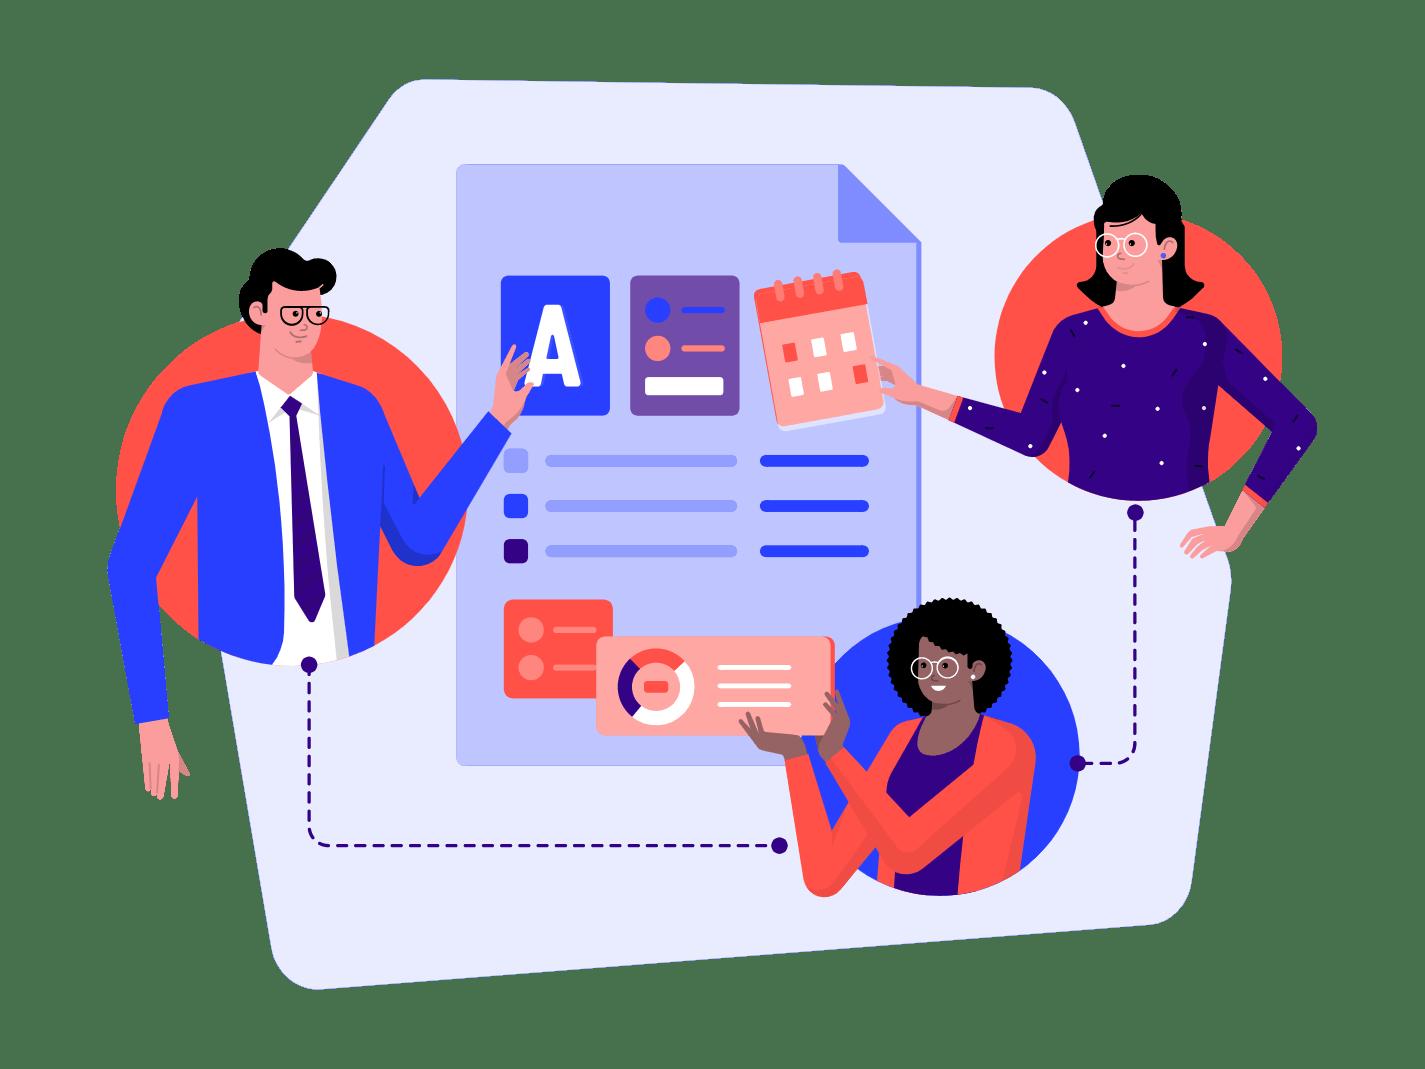 Team collaborating using no code tools